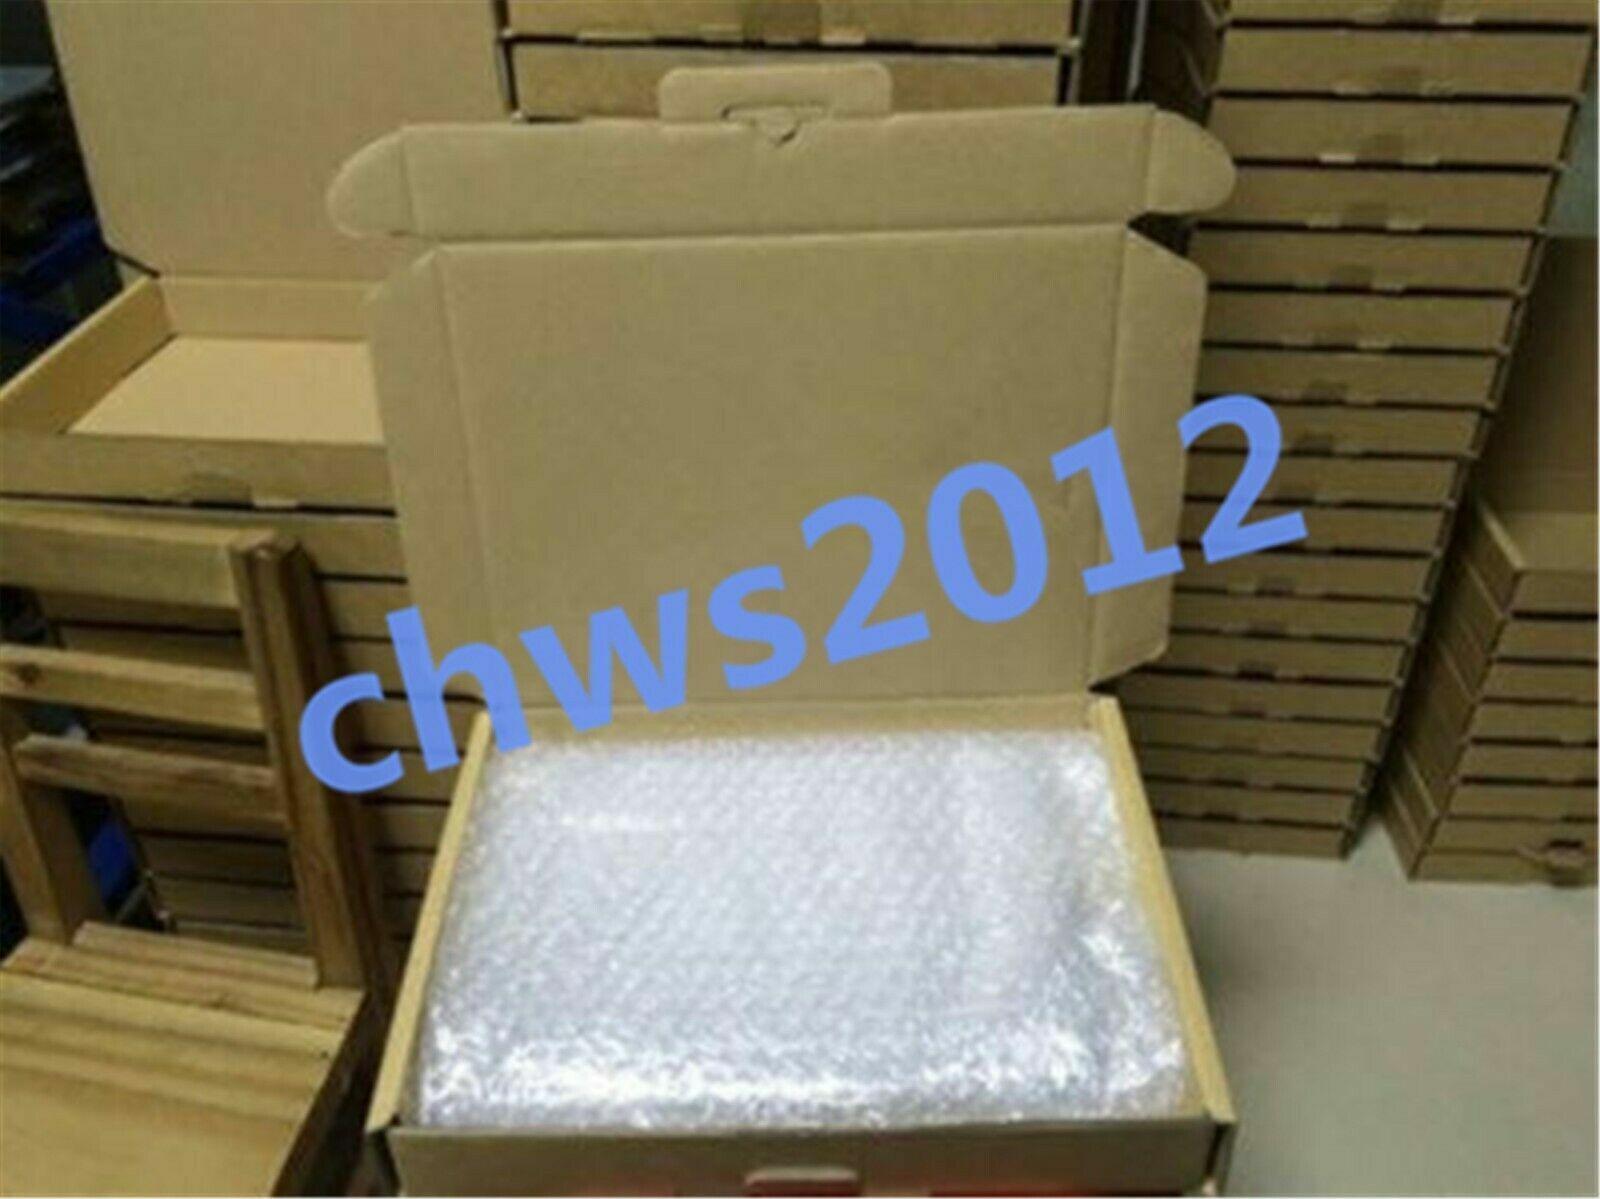 DS1243Y-120 NVSRAM 64KBIT 120NS DIP28x 1pc DALLAS New DS1243Y-120